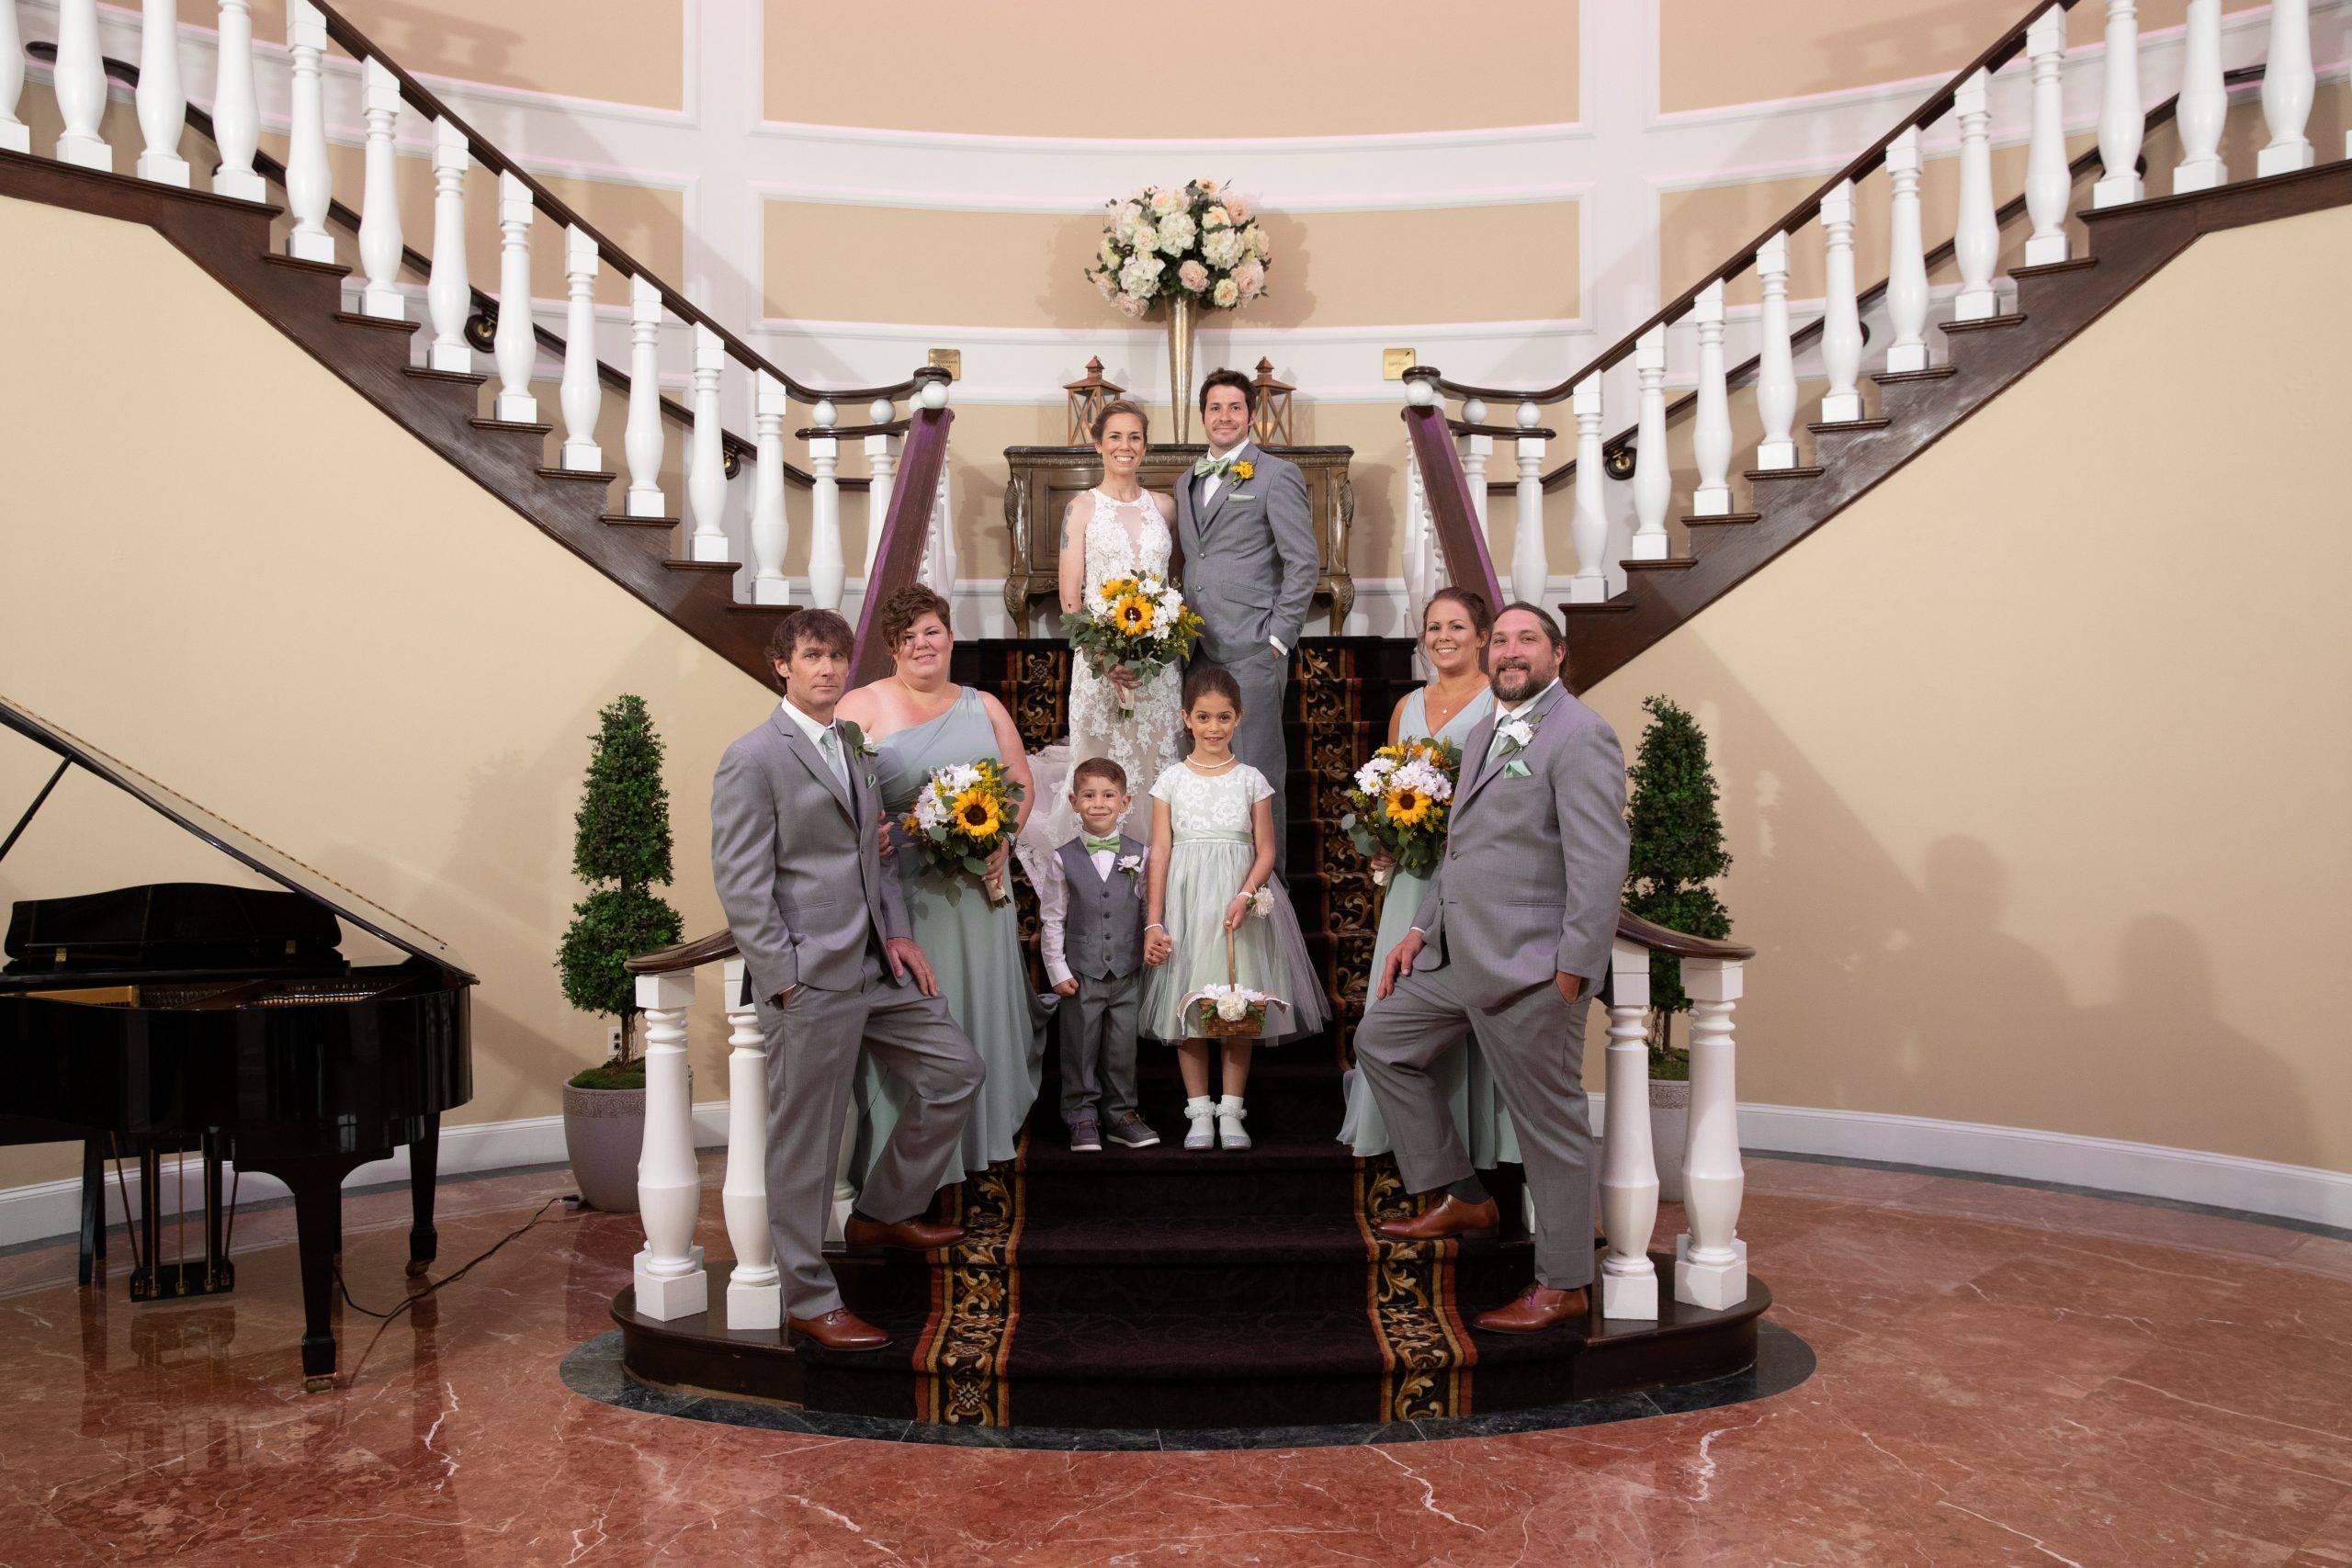 Bridgewater Manor wedding party on staircase